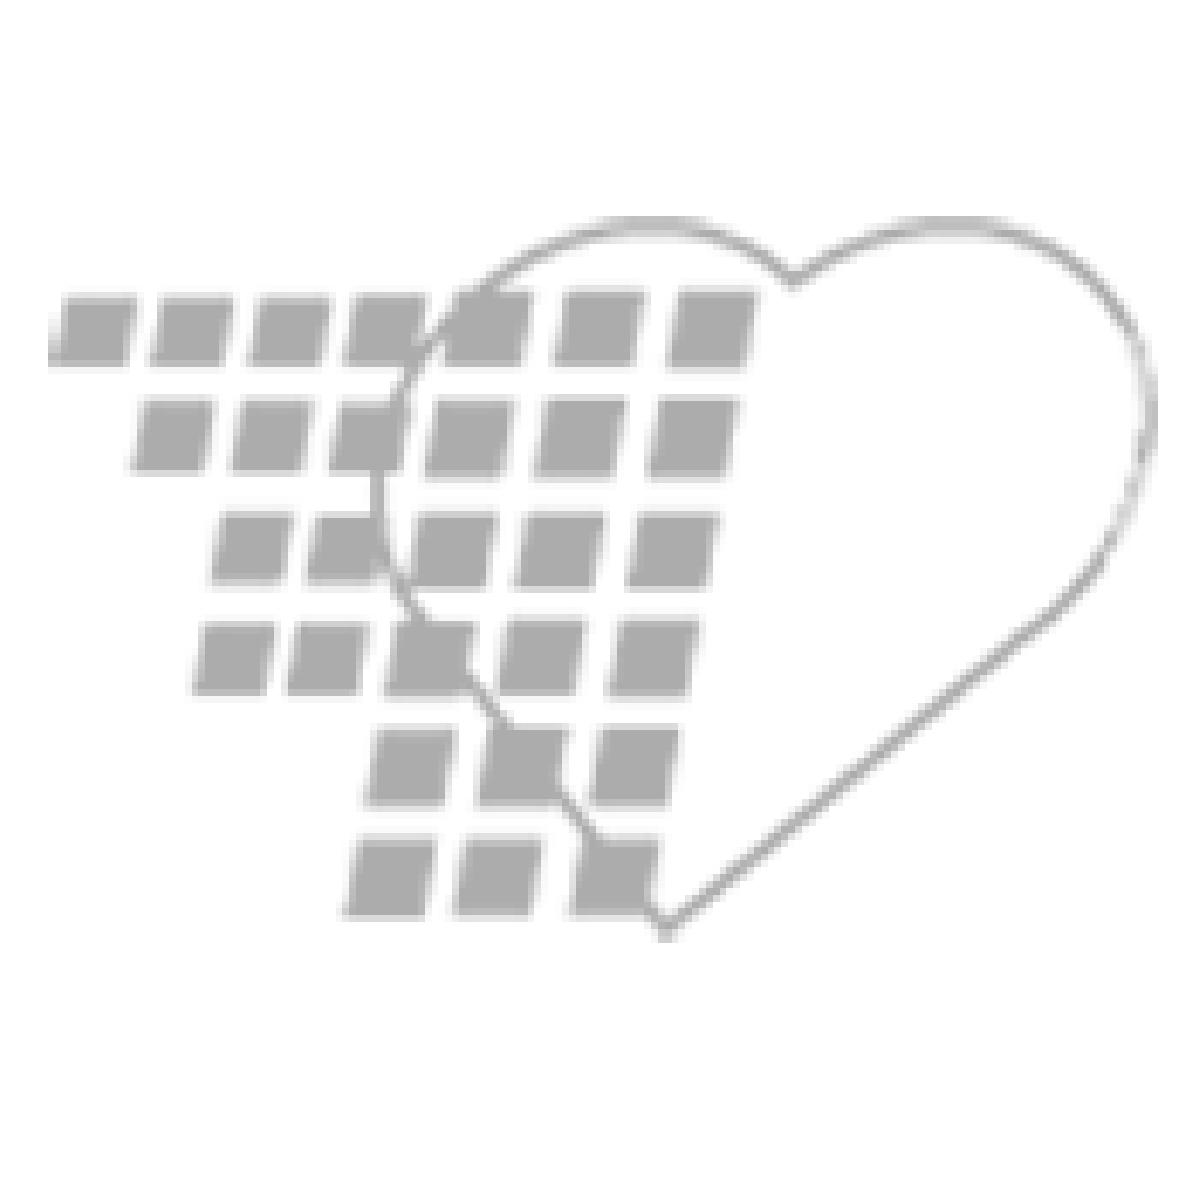 05-02-0116 - Nasco Lubricating Jelly